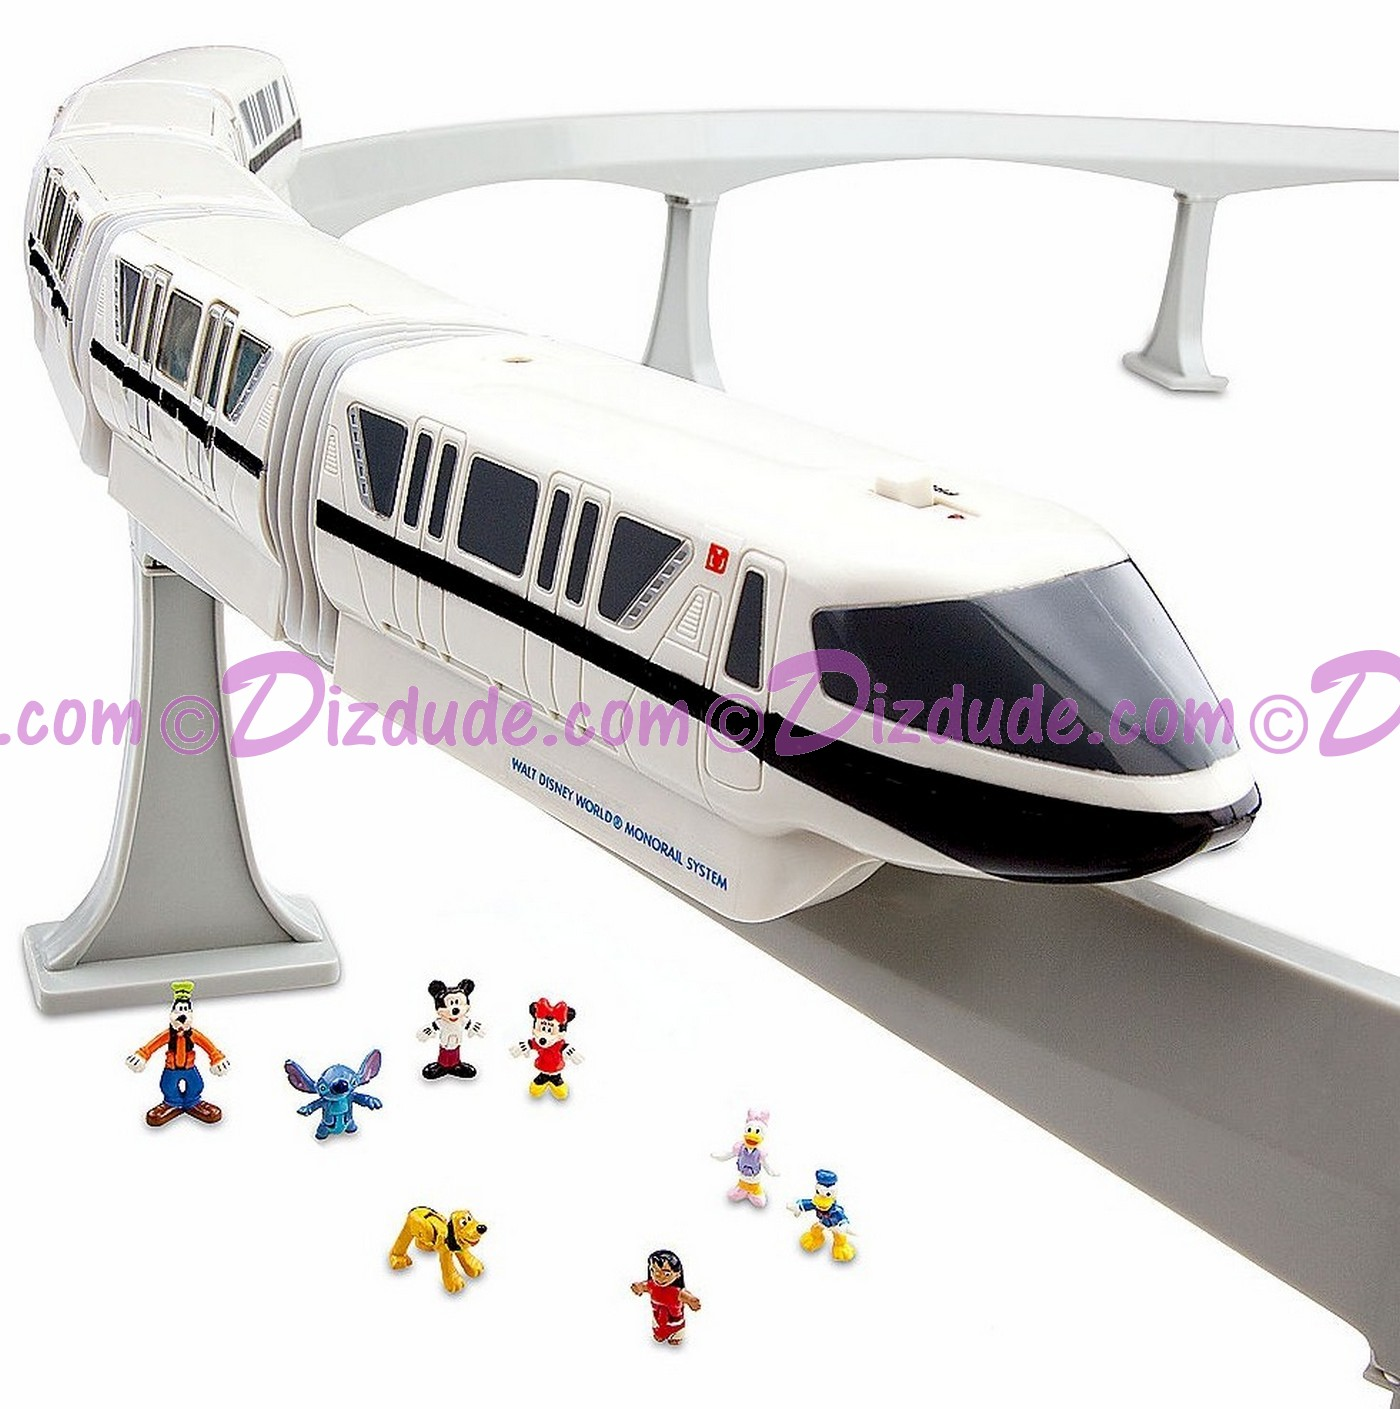 Disney World Monorail Playset © Dizdude.com